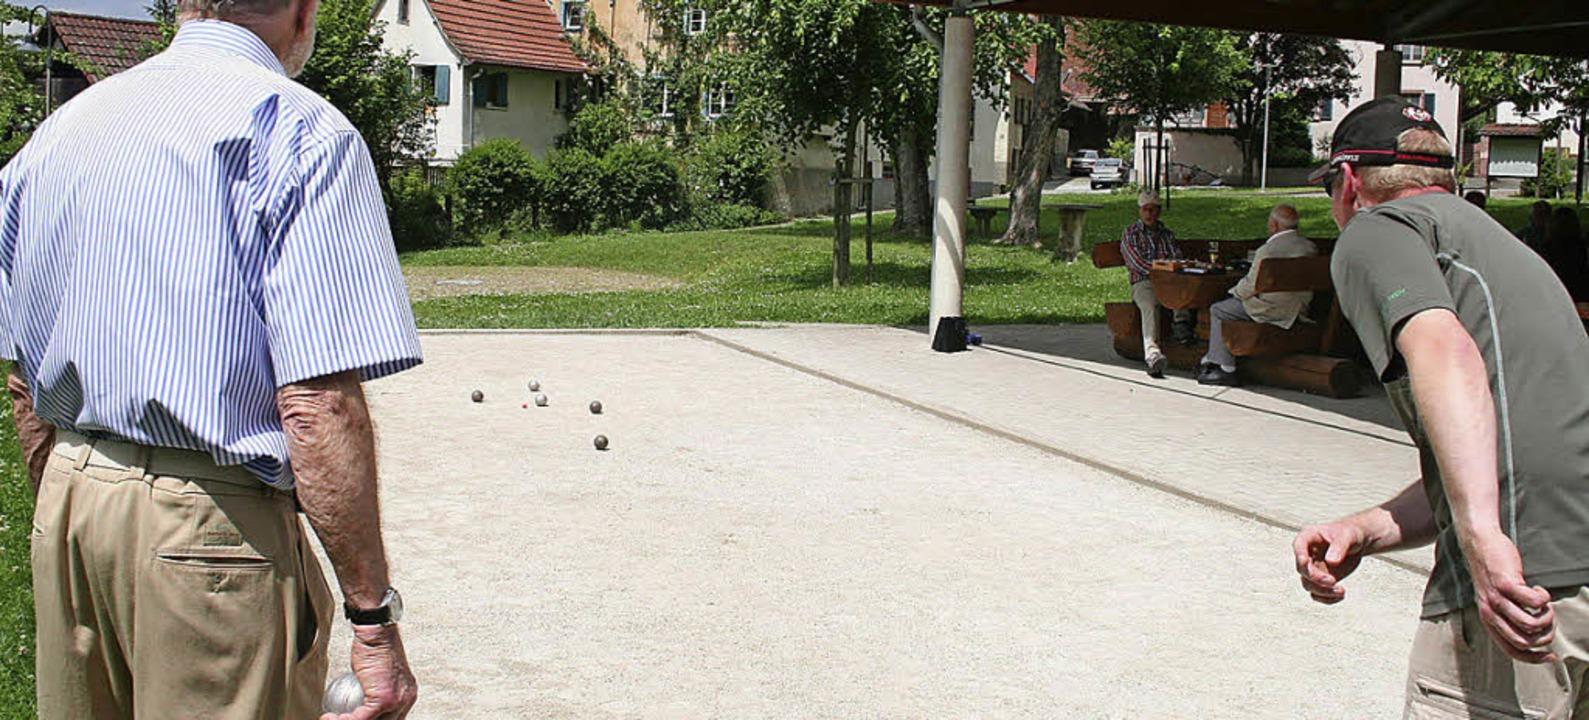 Volle Konzentration erforderten die Be...m Holzener Bouleplatz. Foto: Ines Bode  | Foto: Ines Bode